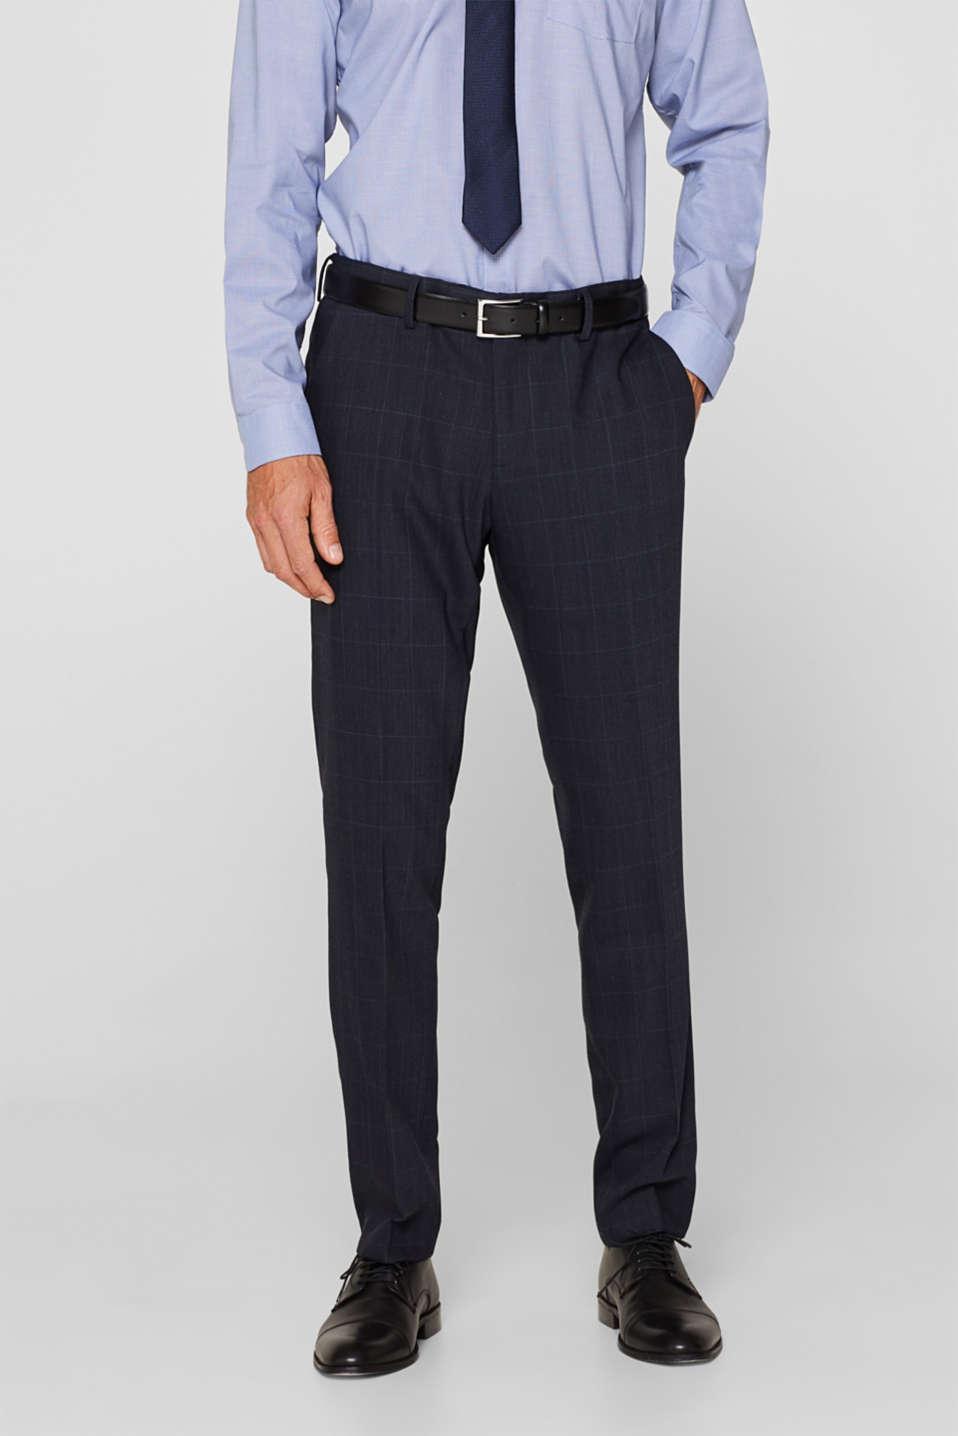 Pants suit, DARK BLUE, detail image number 4